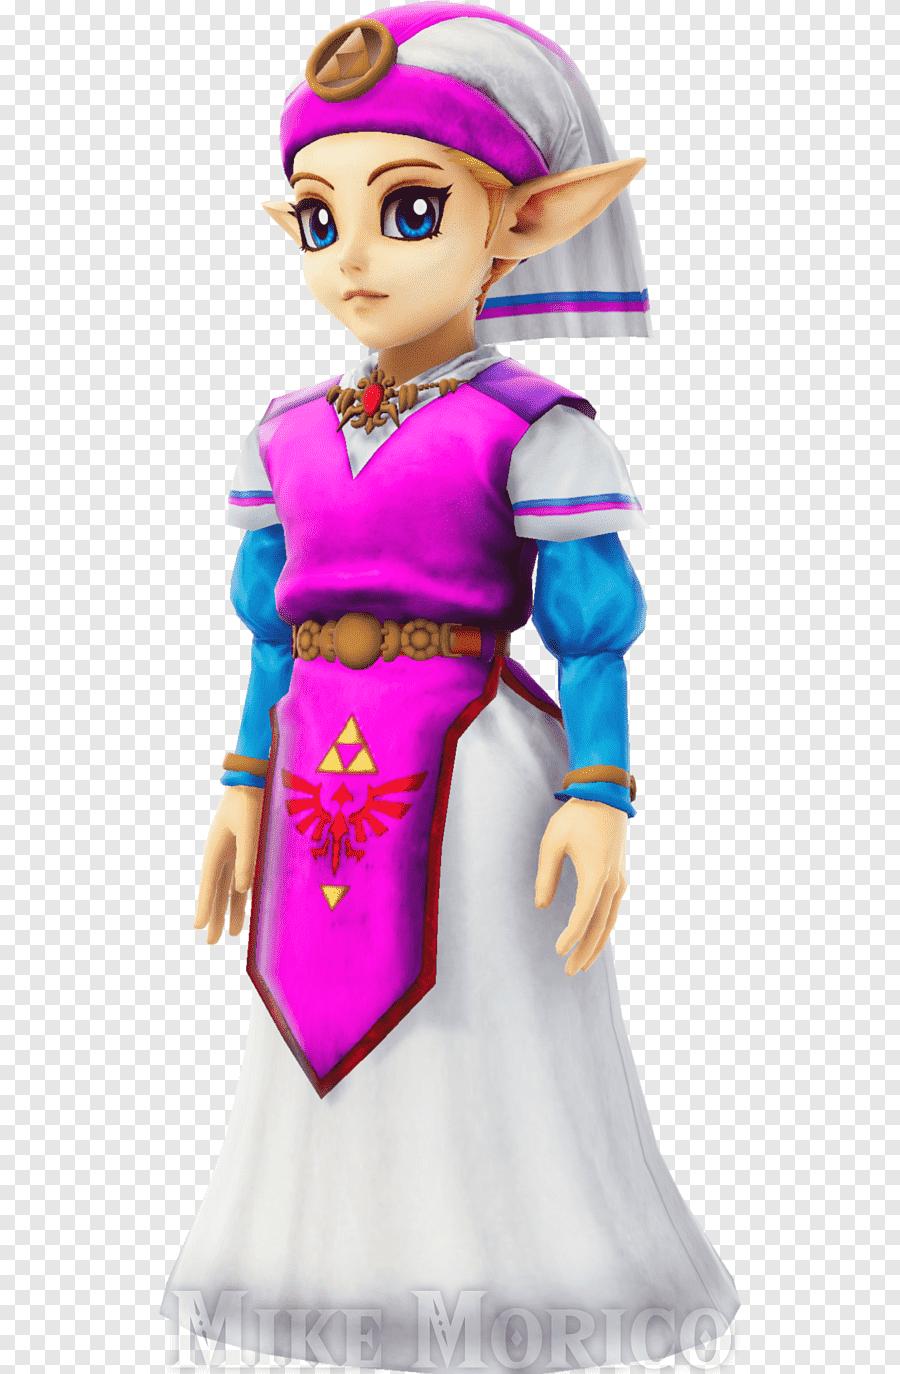 Princesse Zelda Ocarina Of Time : princesse, zelda, ocarina, Legend, Zelda:, Ocarina, Princess, Zelda, Character, Fiction,, Zelda,, Purple,, Fictional, PNGEgg